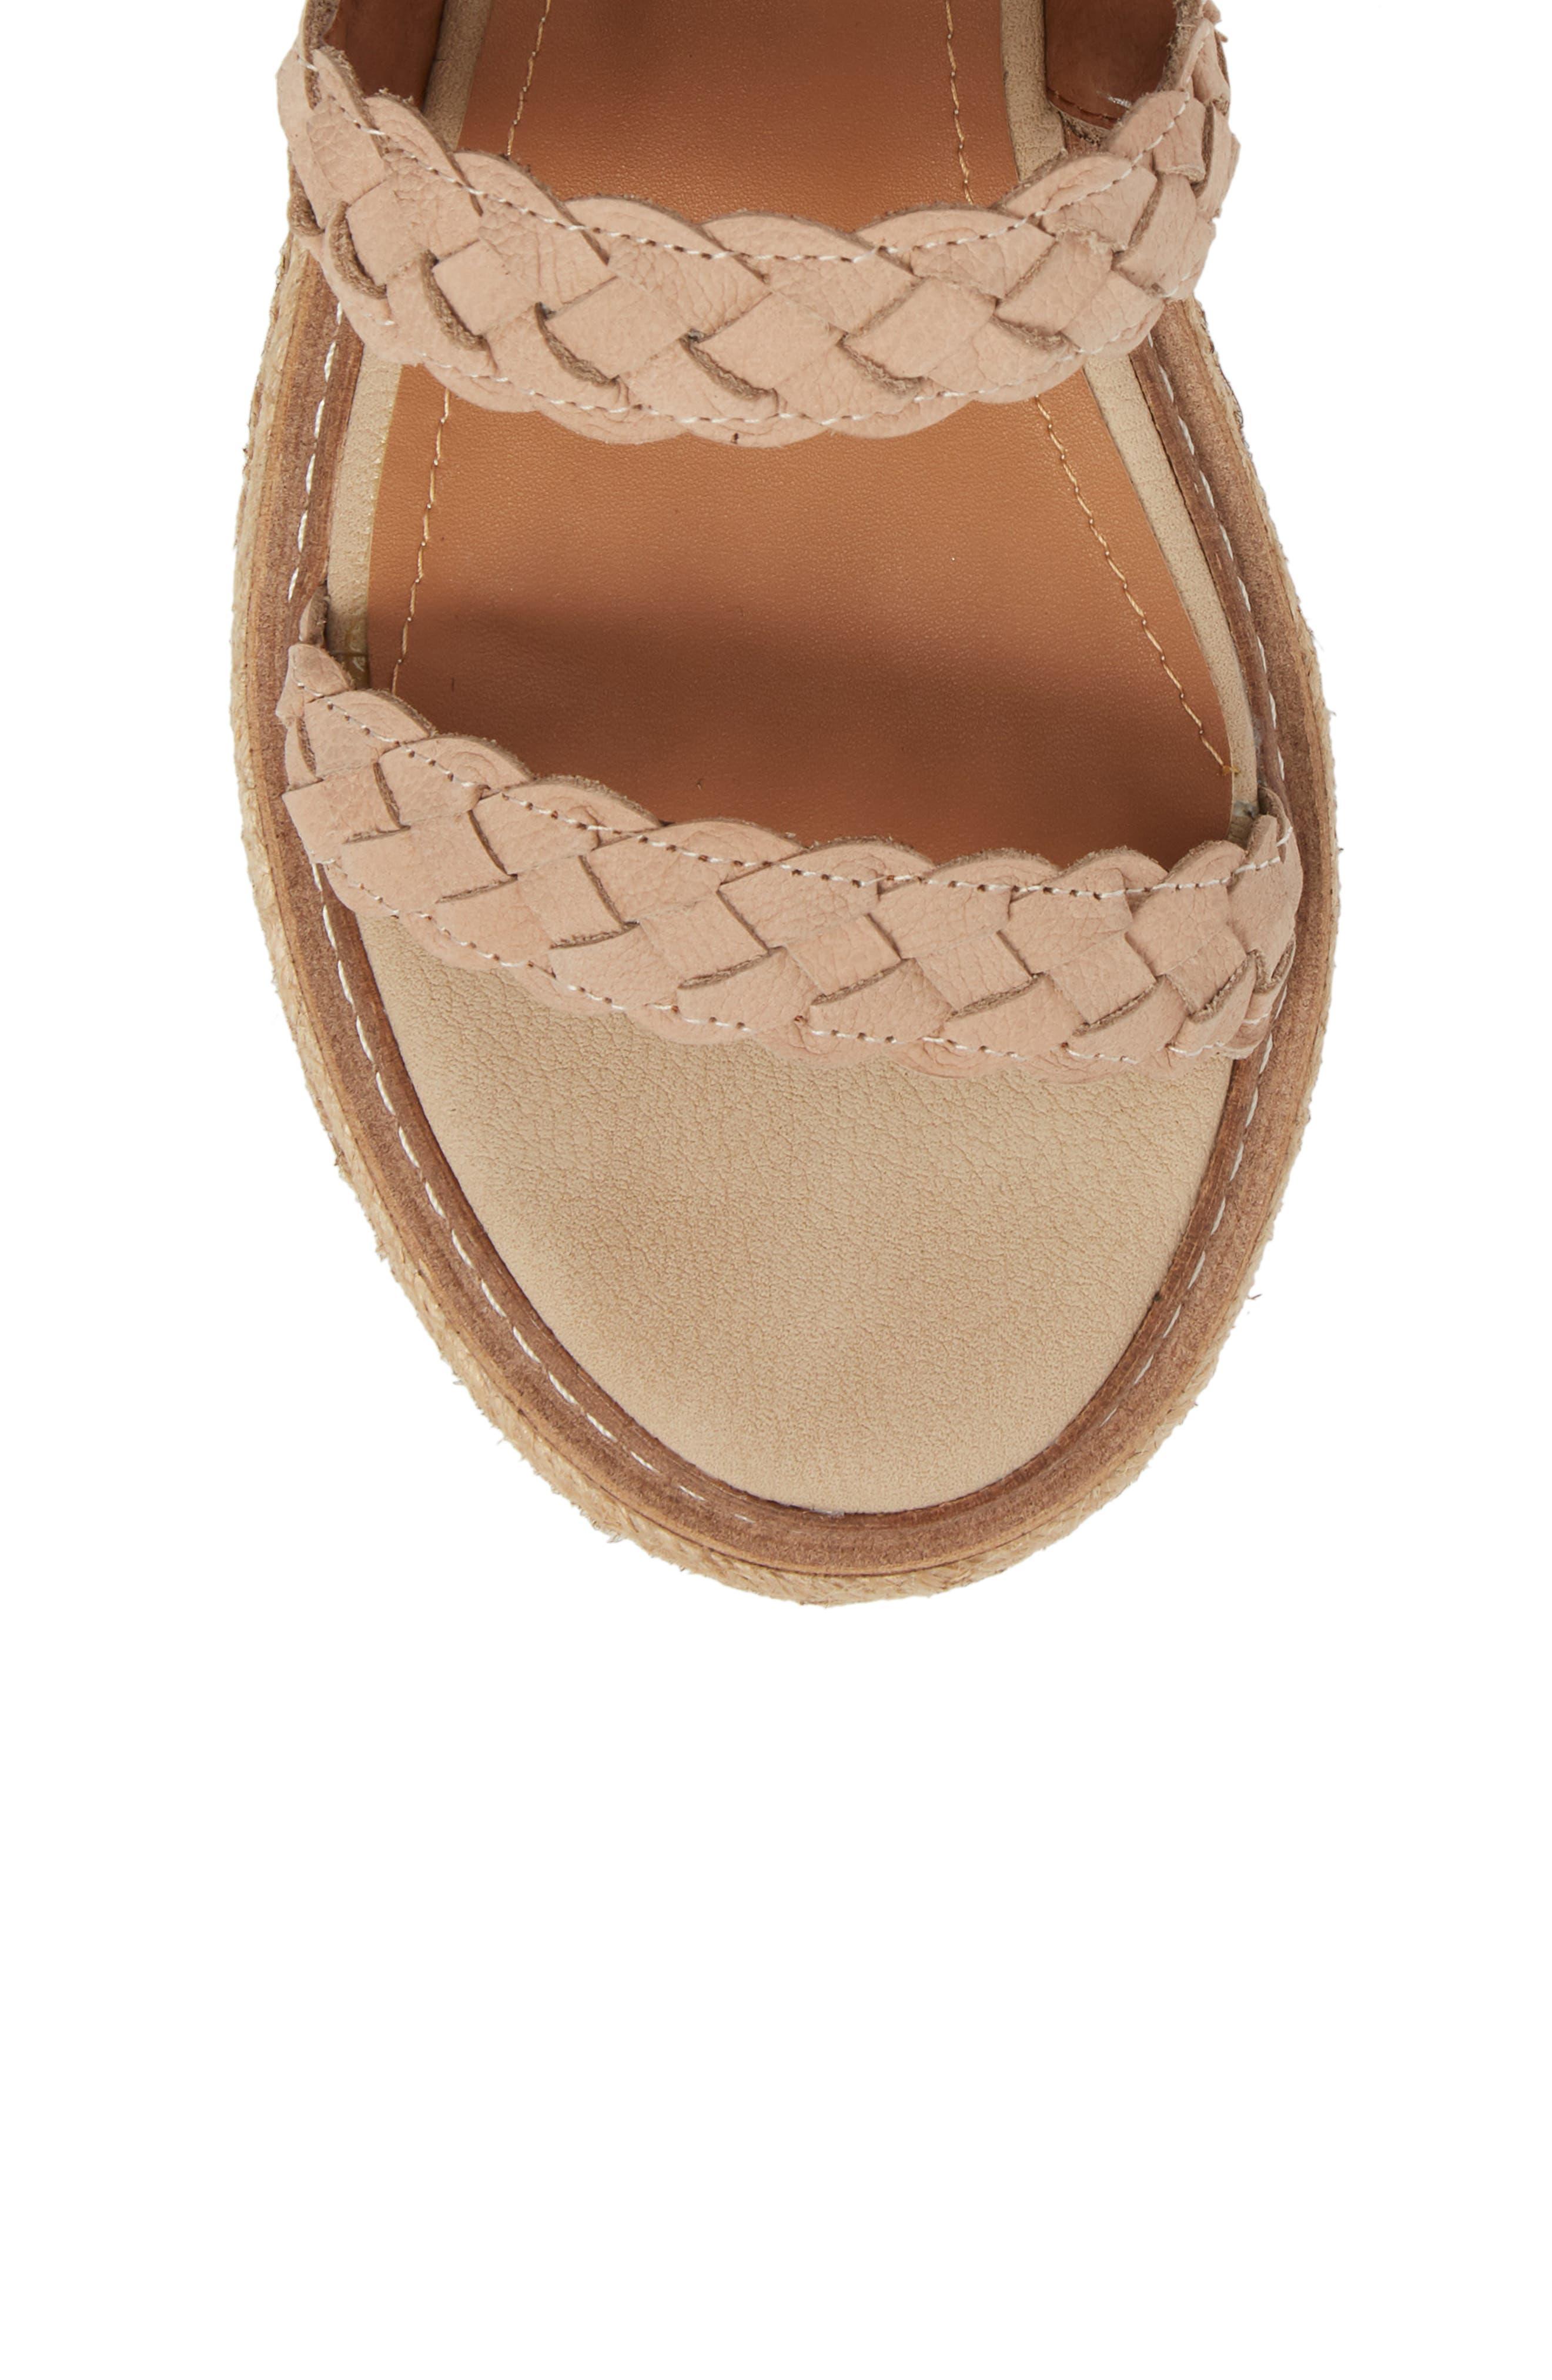 Nieve Braided Platform Sandal,                             Alternate thumbnail 4, color,                             Natural Leather